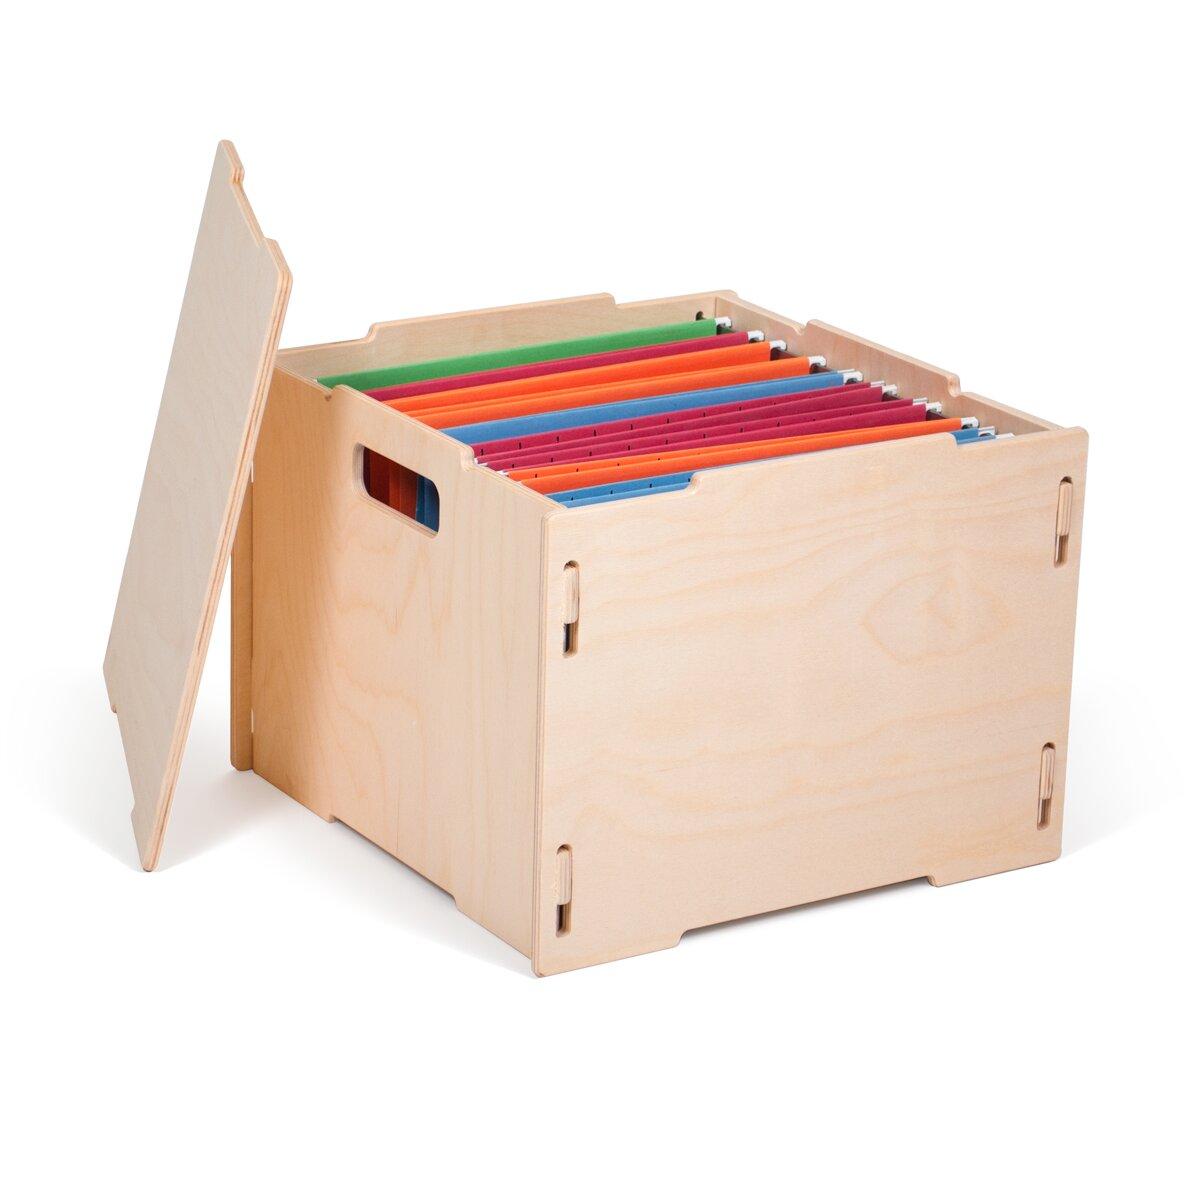 office file boxes. Office File Boxes. Boxes E